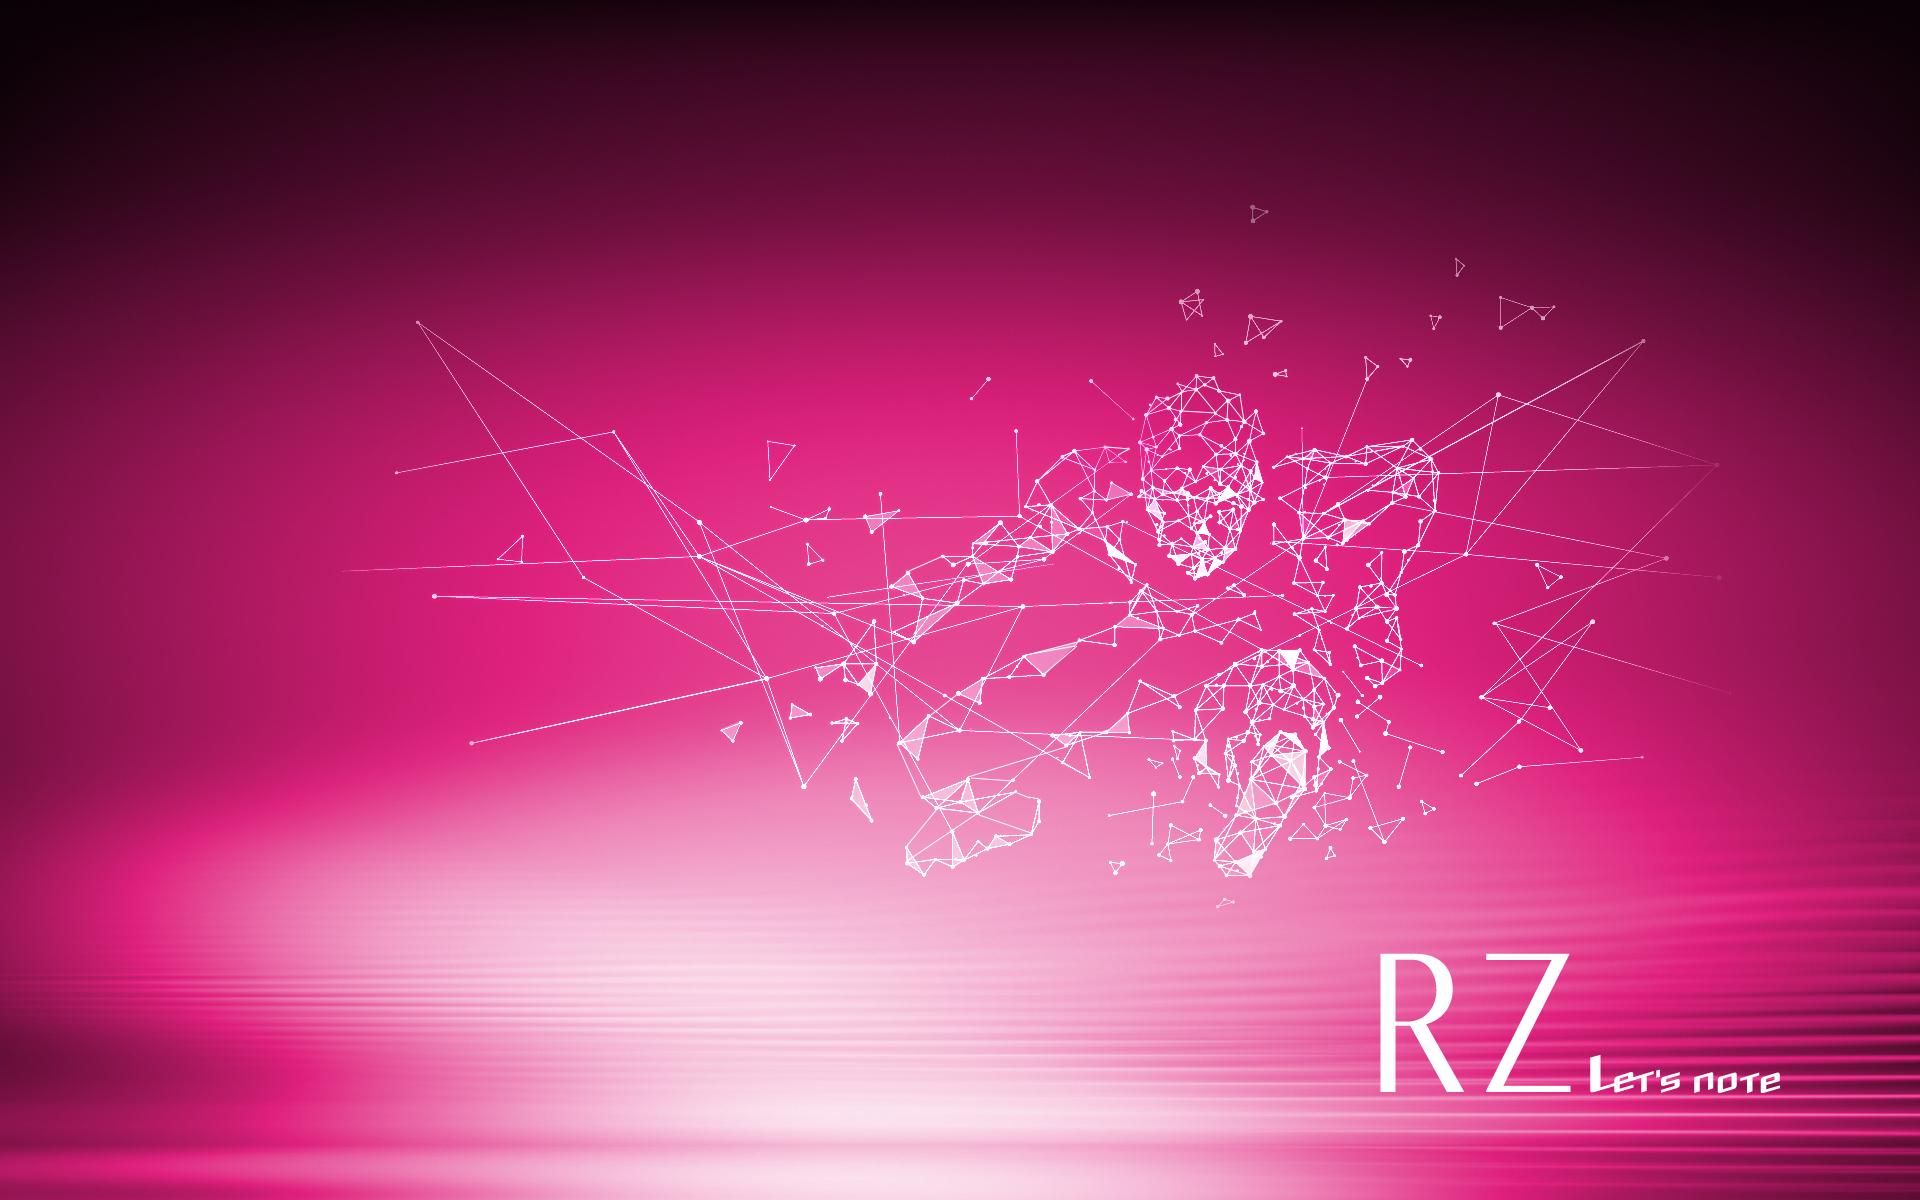 RZシリーズの壁紙です。